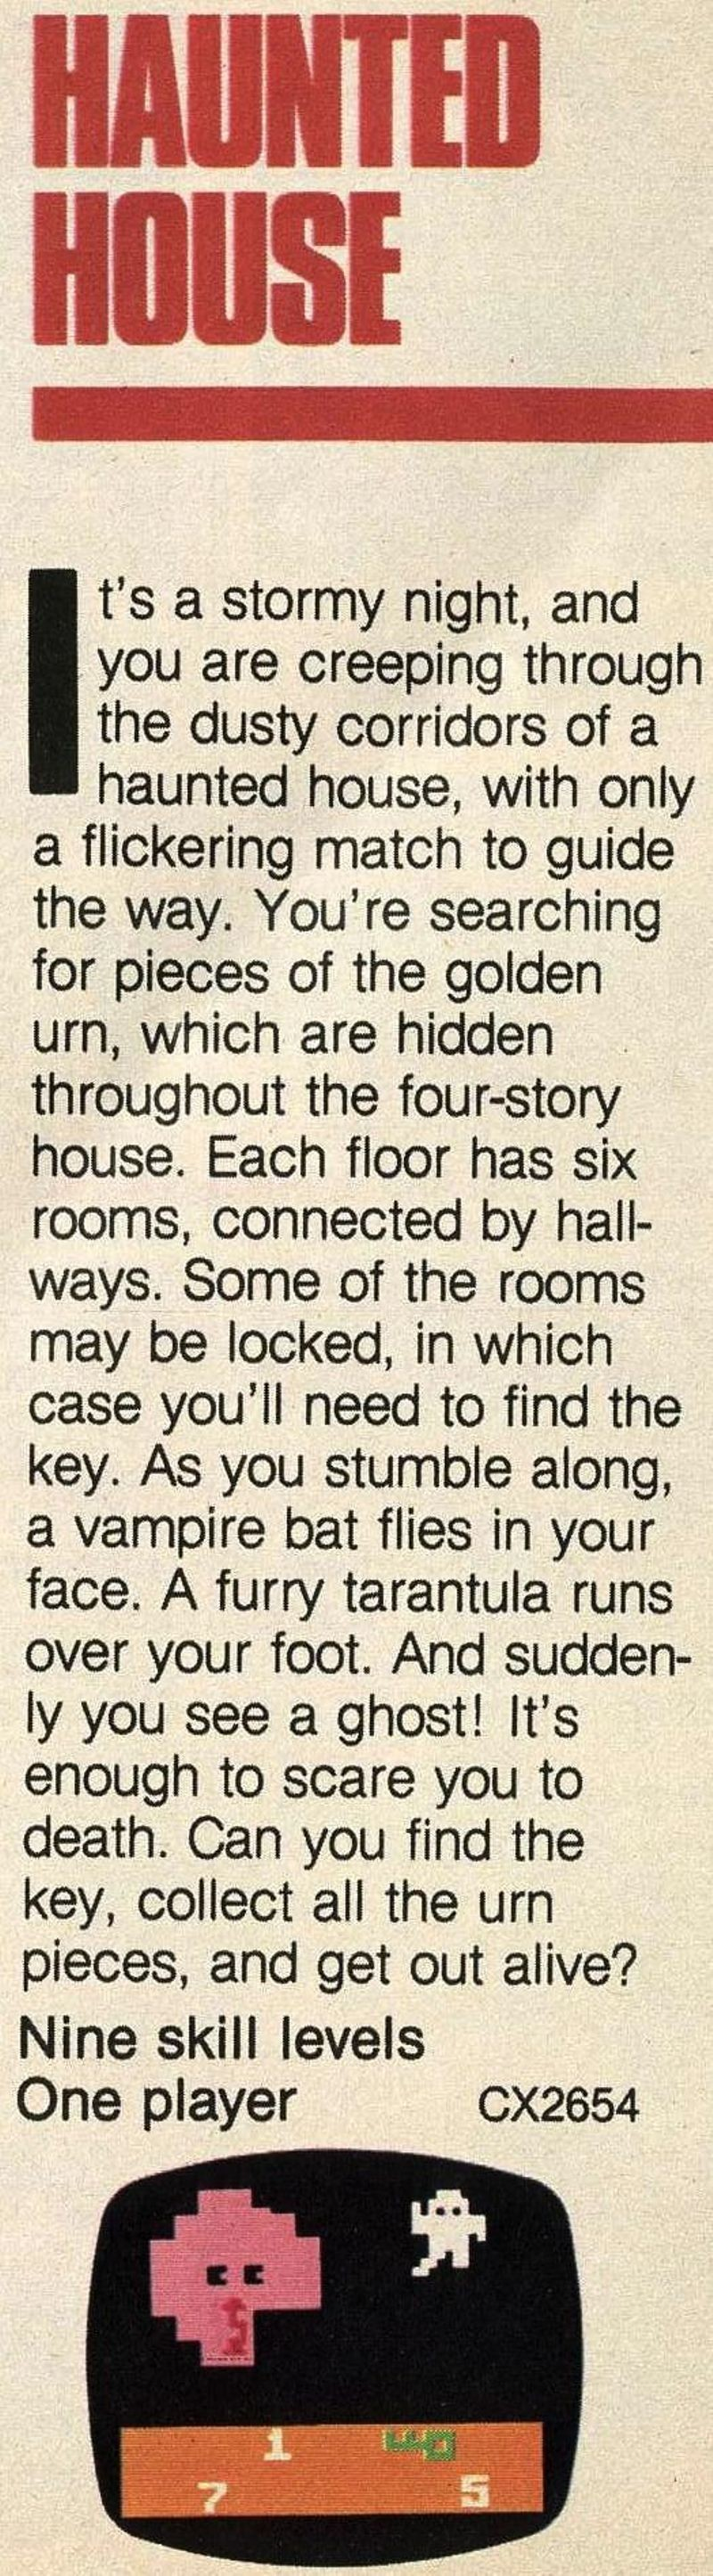 Haunted House entry in the 1981 Atari Catalog.